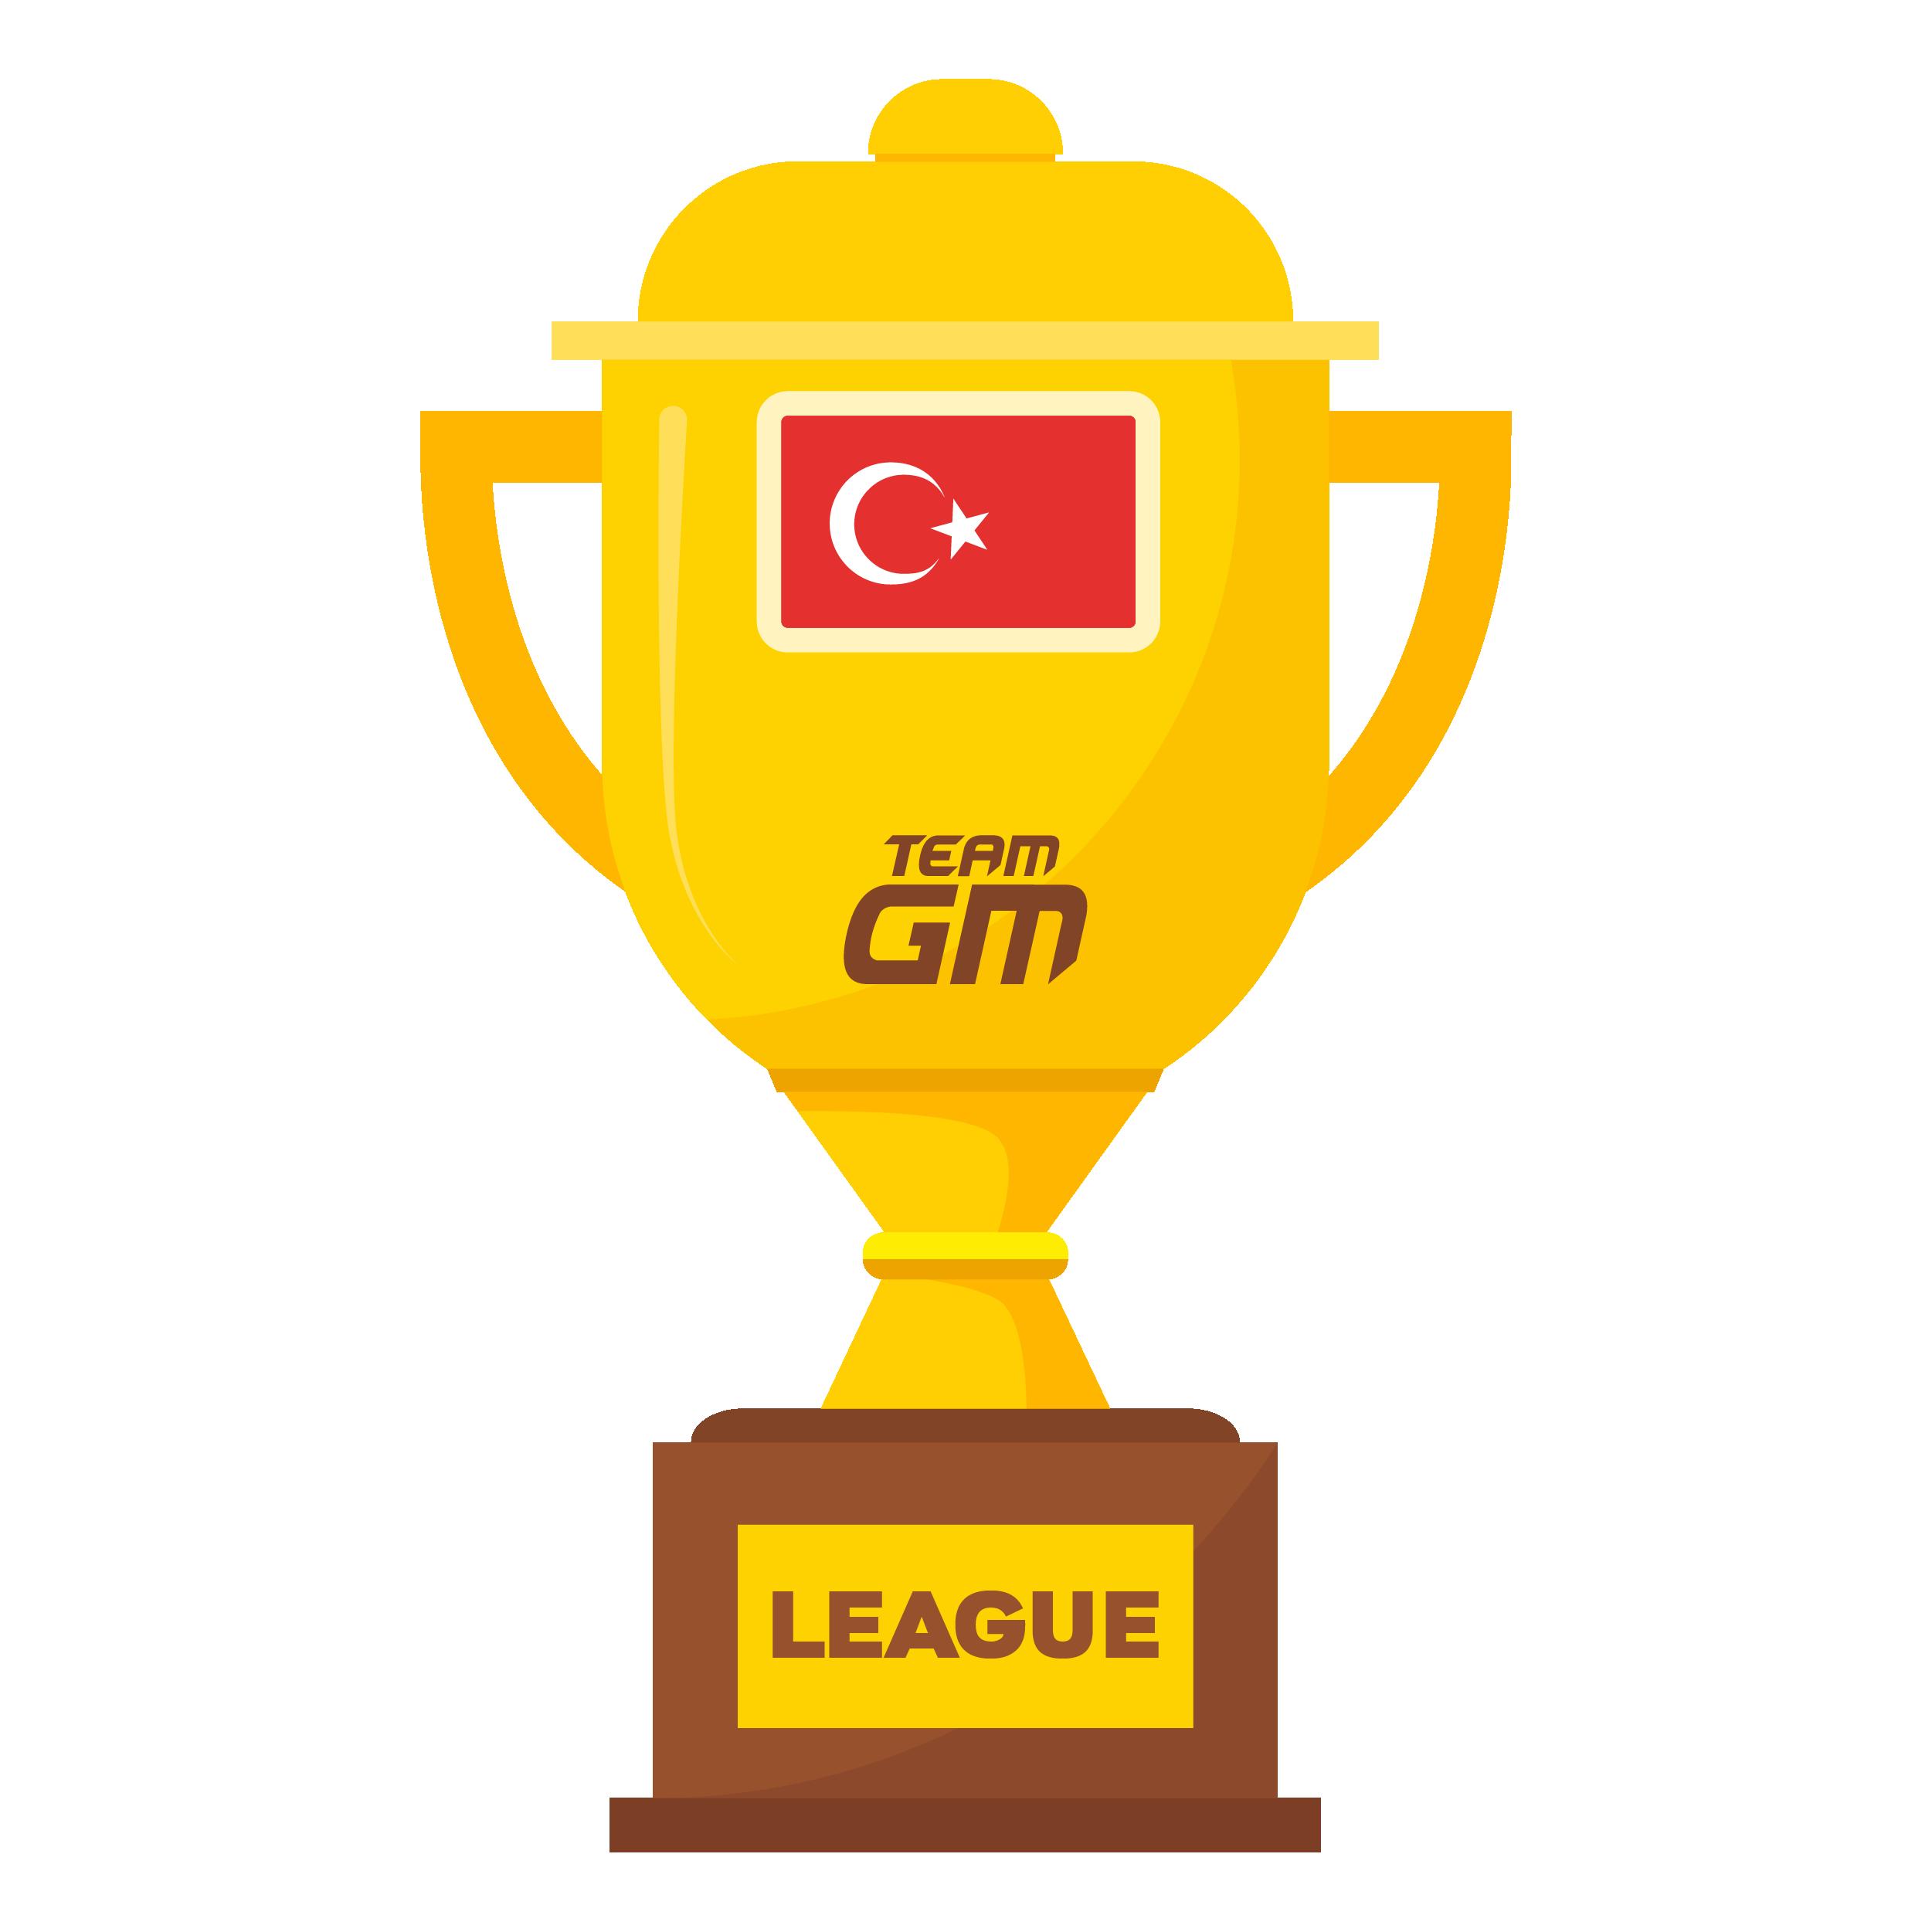 3RD - TURKISH LEAGUE